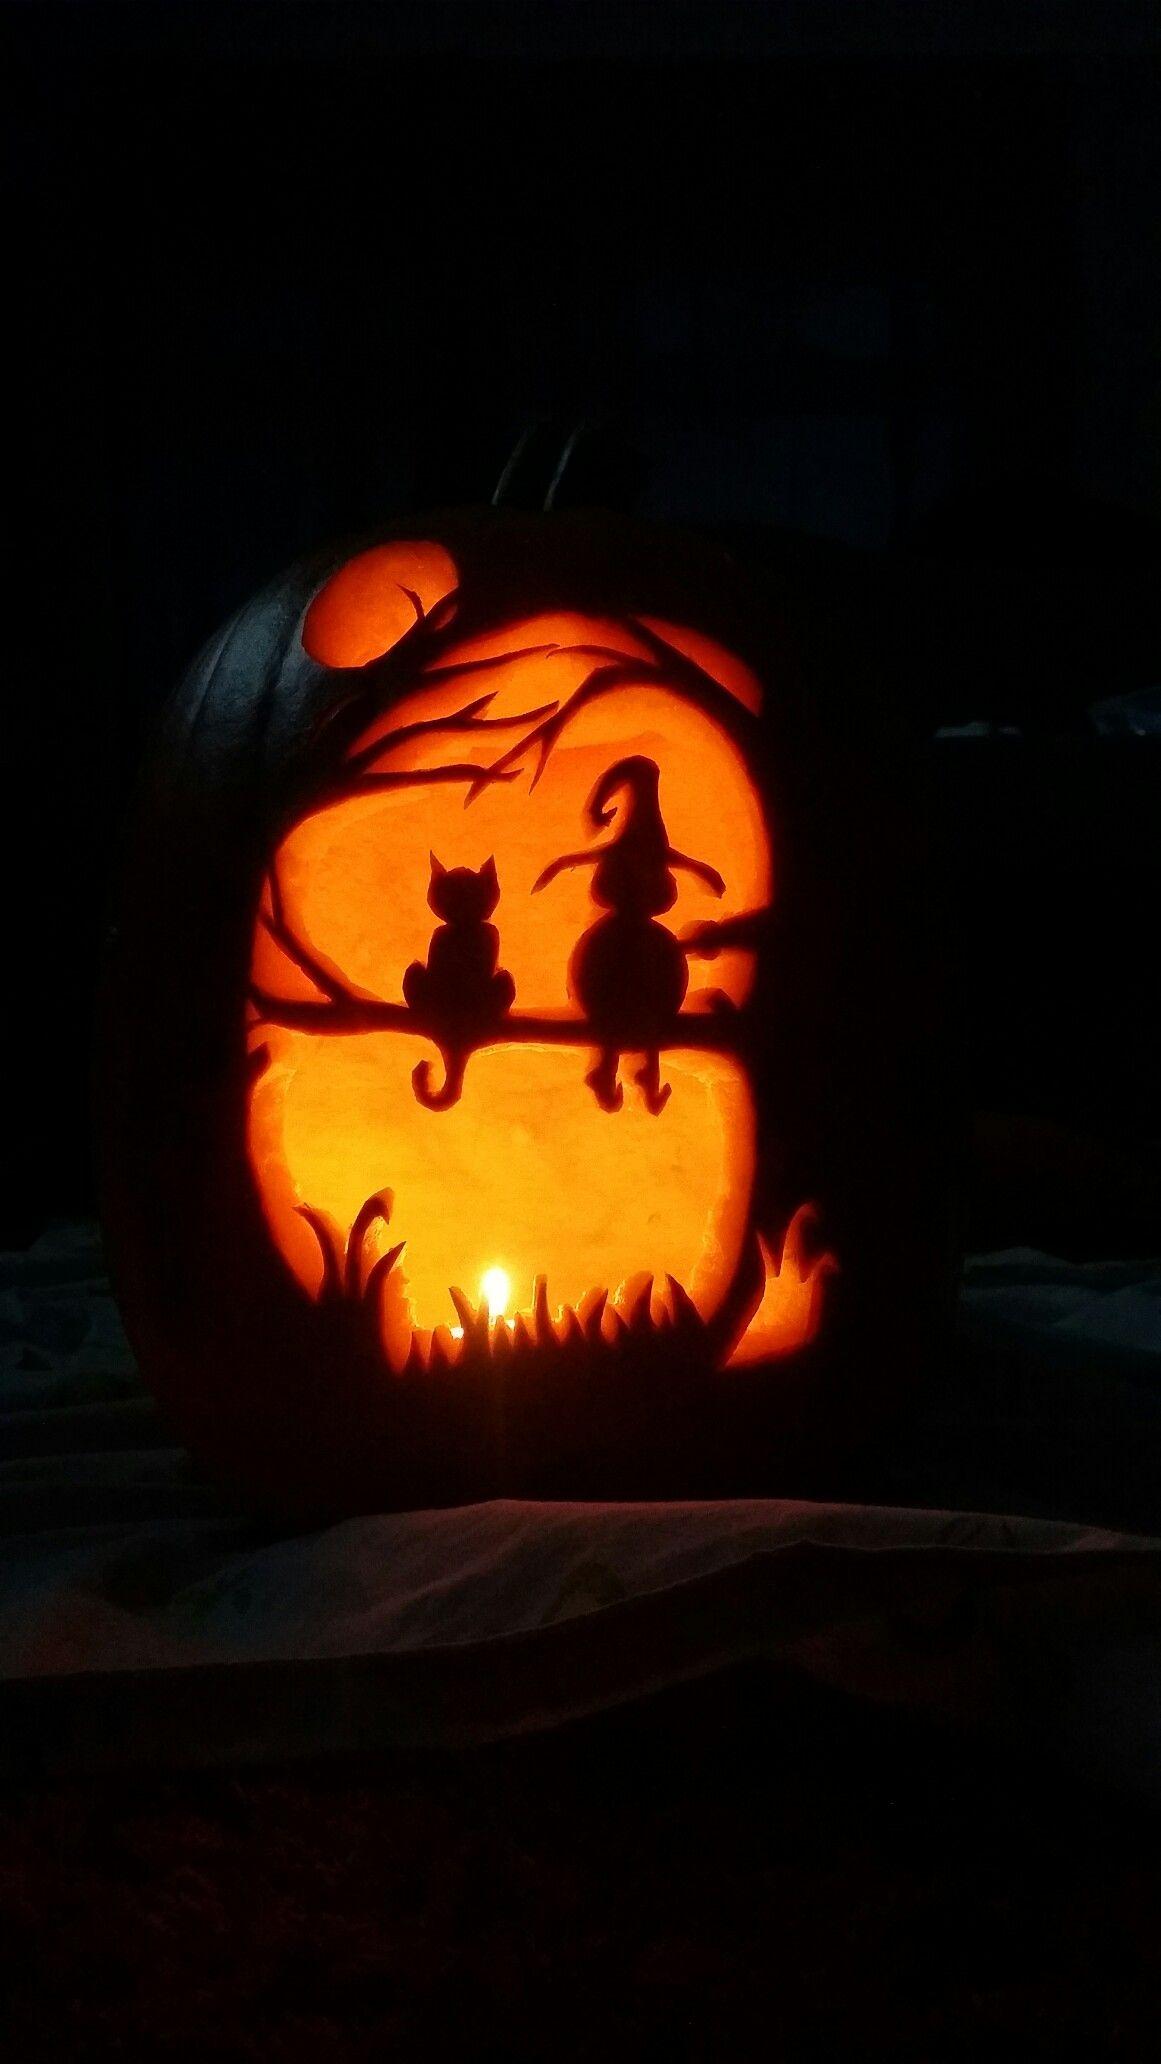 Intagliare Zucca Per Halloween Disegni witch n cat #pumpkins #carvings #halloween (con immagini